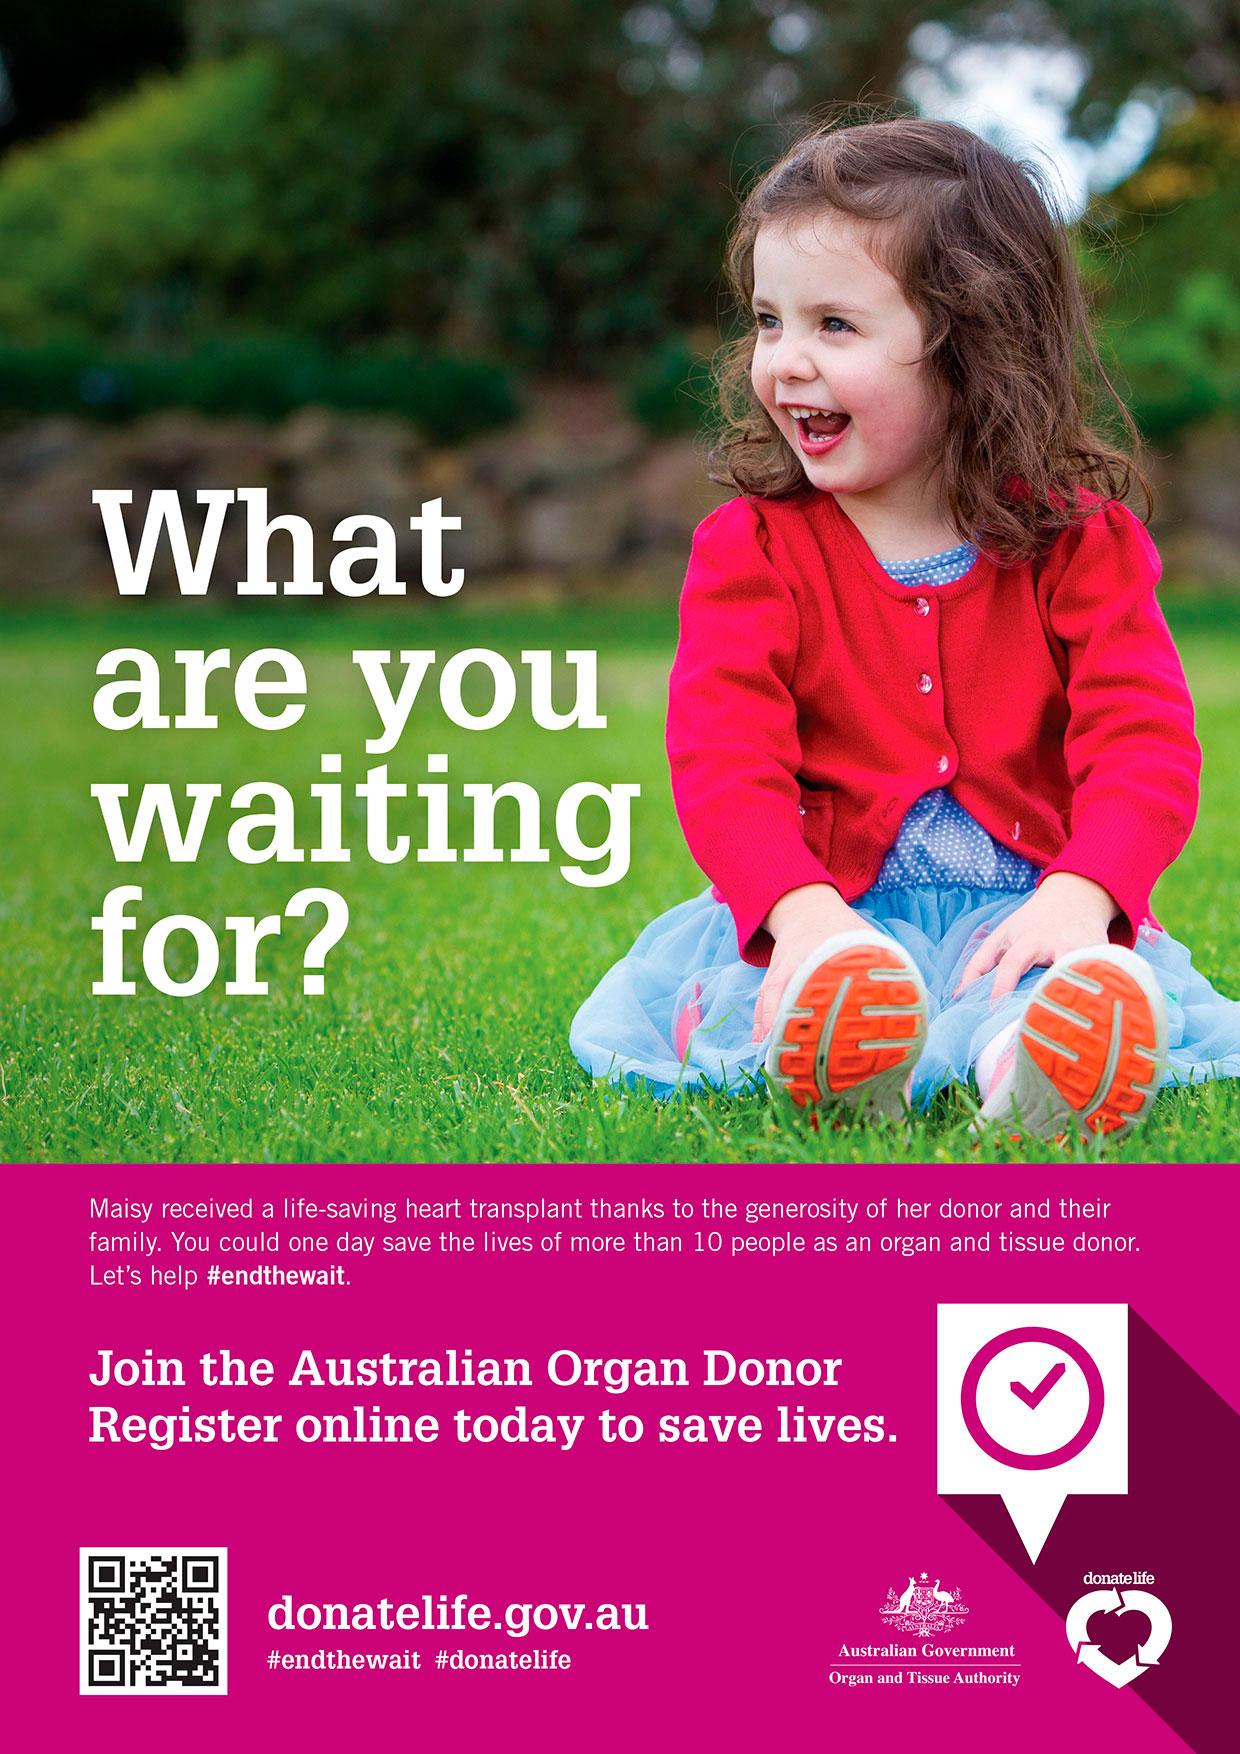 Organ & Tissue Authority - Australian Government